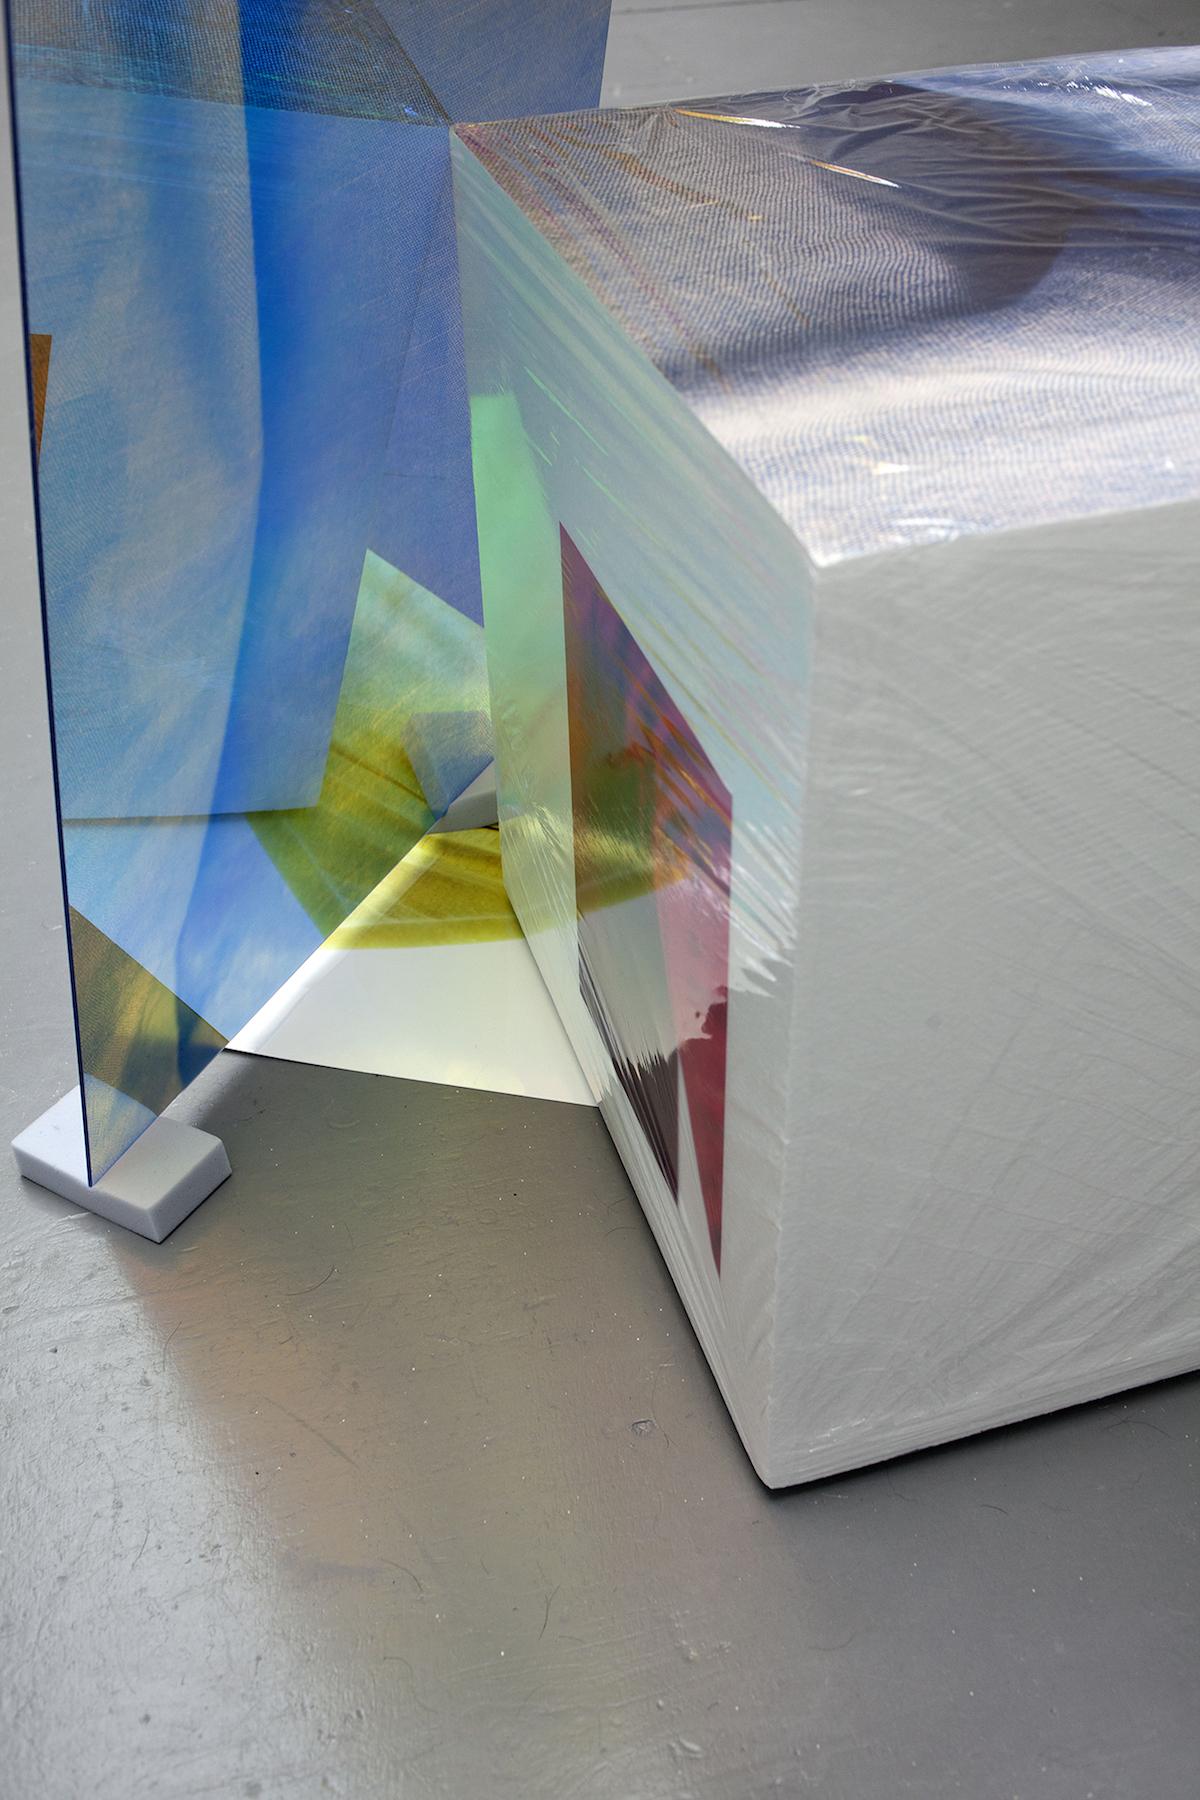 Sweaty Sculpture (denim) ,112 x 100 x 50 cm, flatbed print on plexiglass, photo-stickers on polystyrene, cellophane, sponges